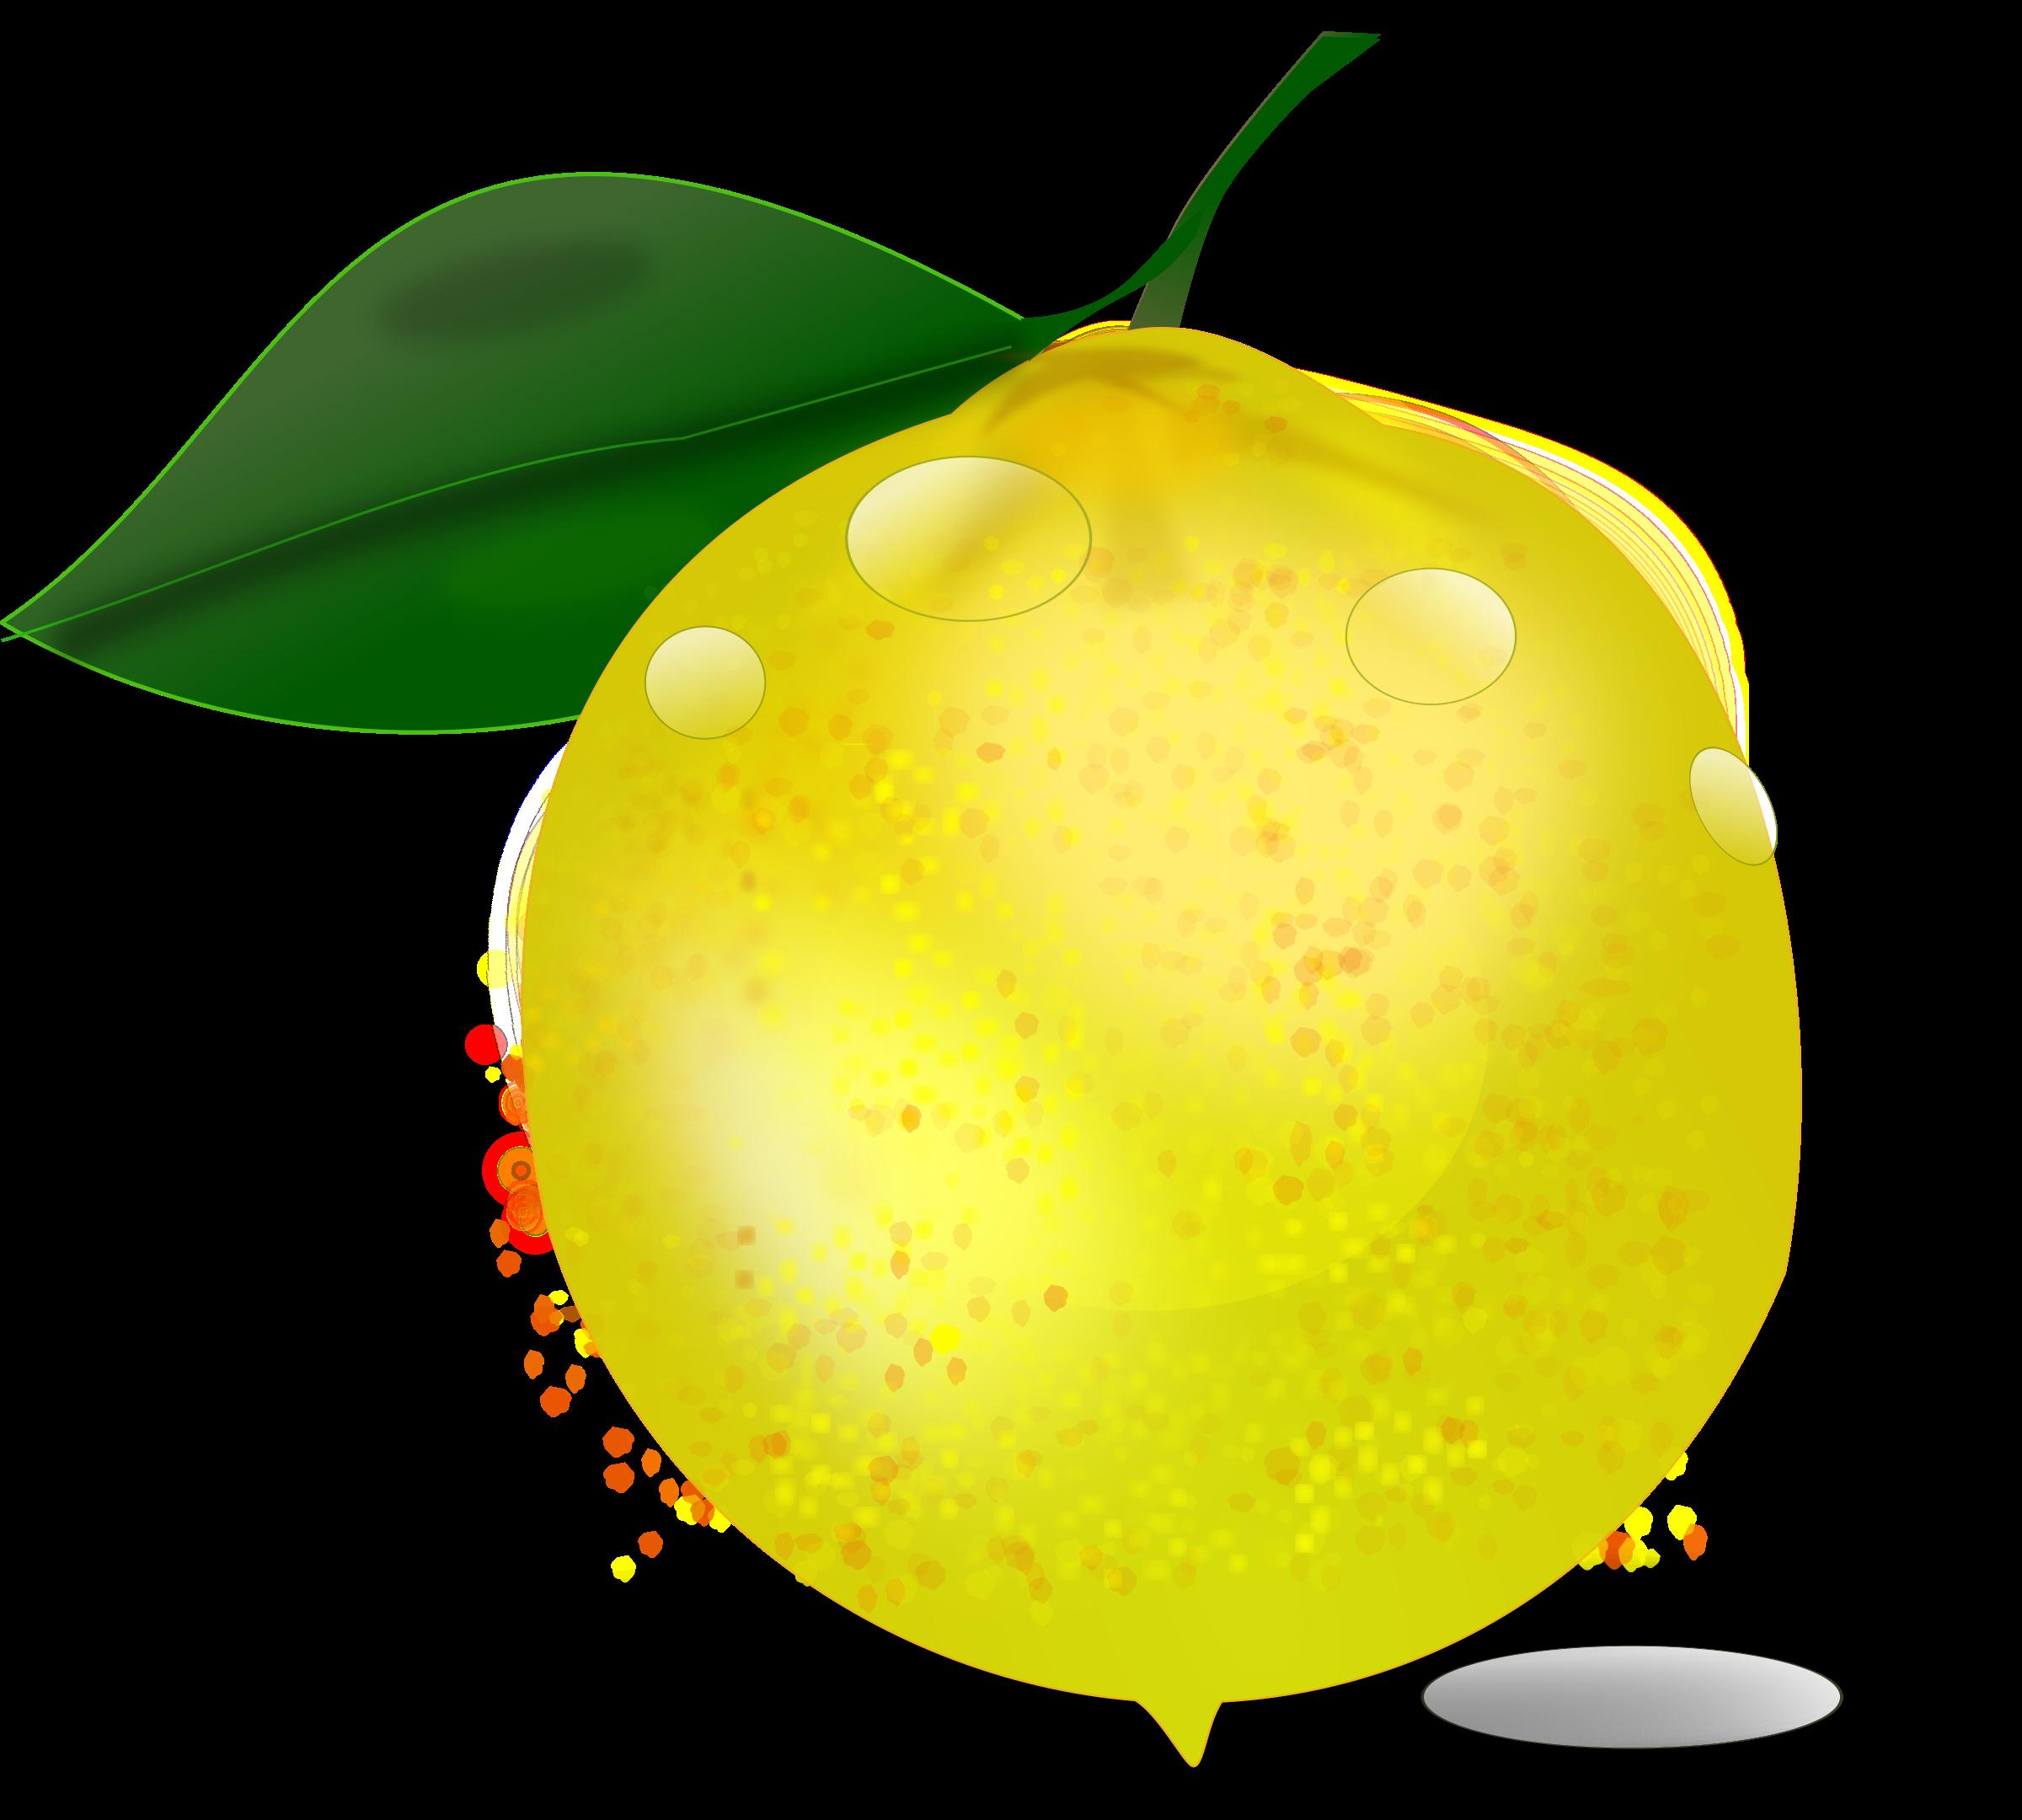 Lemon photorealistic big image. Pear clipart pear slice